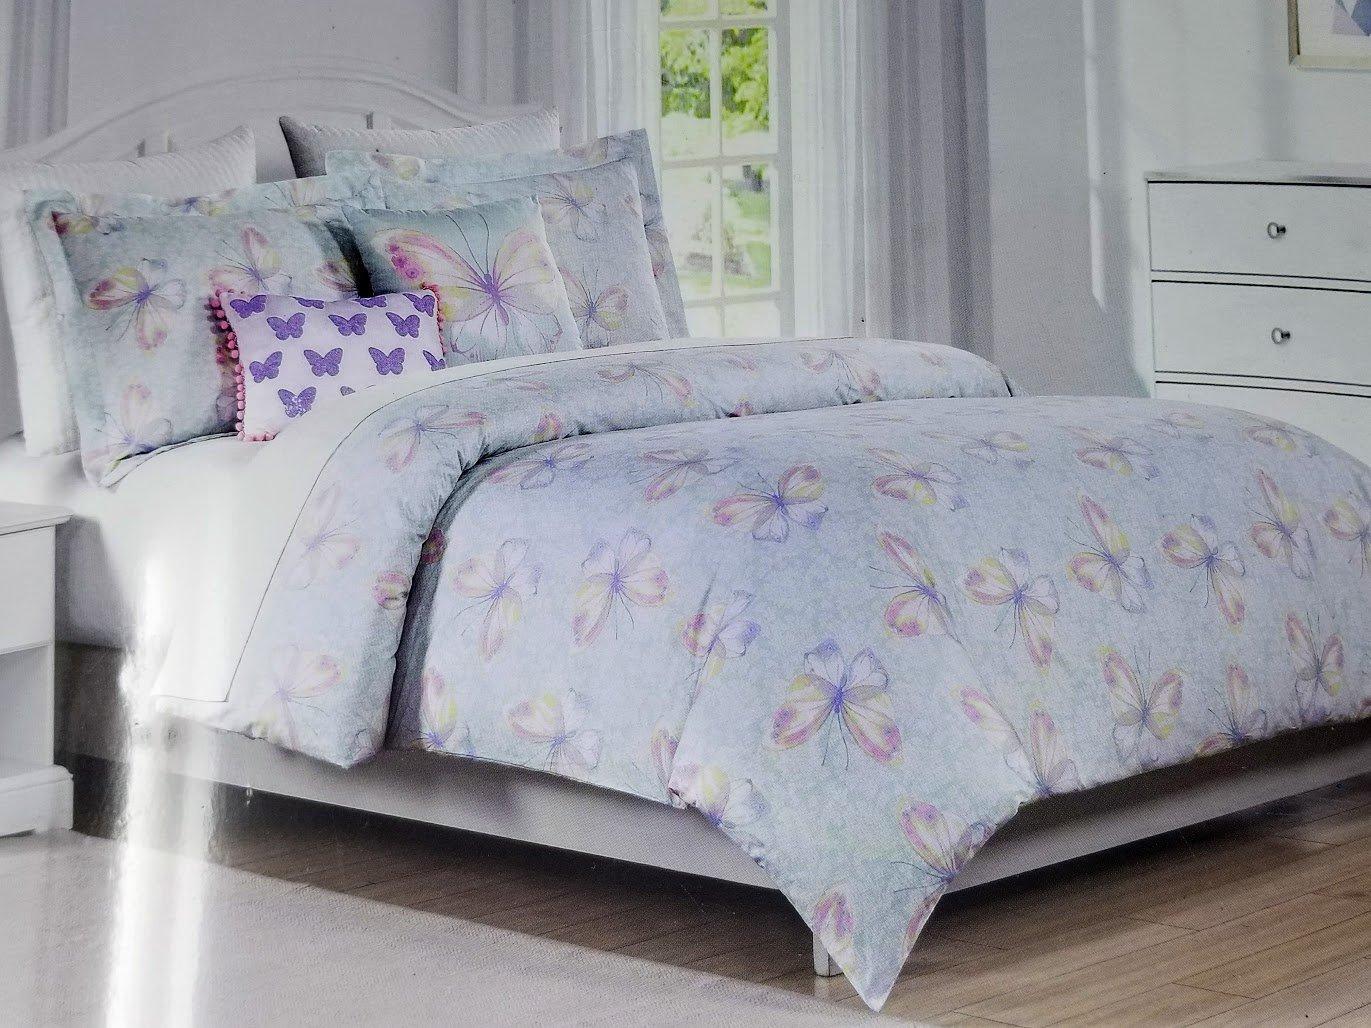 Tahari Home Kids 4pc Twin Comforter Set - Butterflies w/ 2 Decorative Pillows